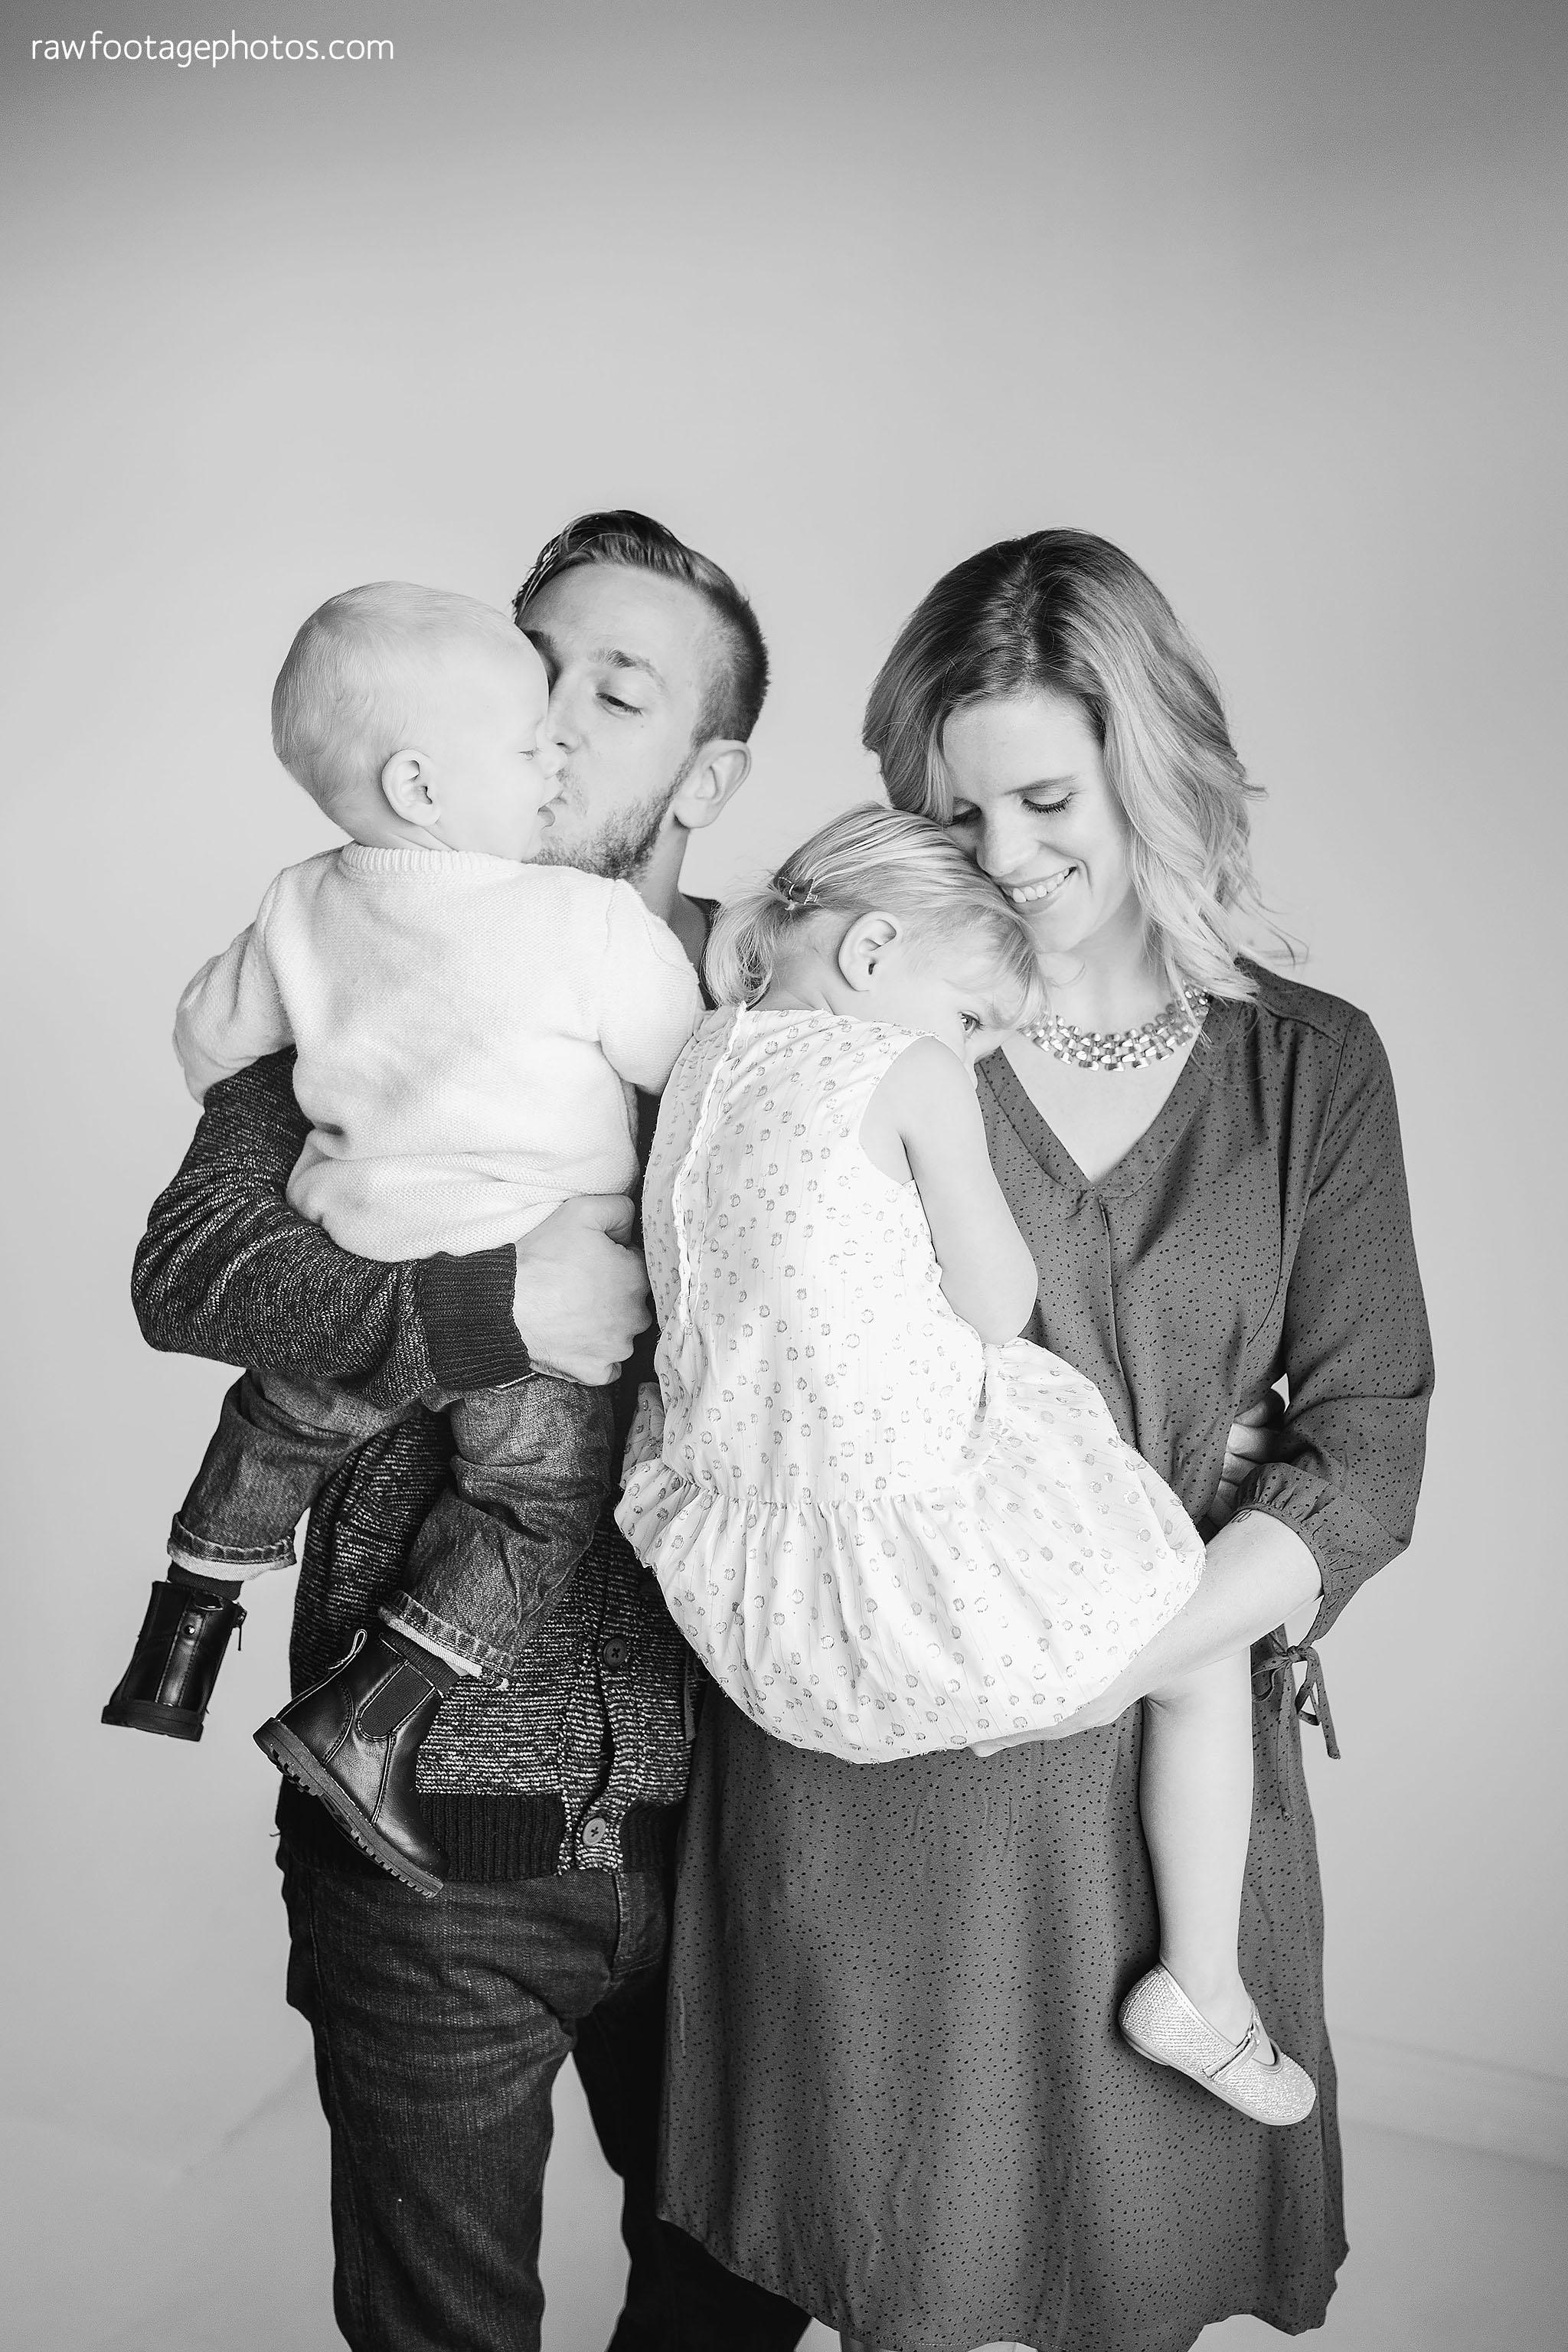 london_ontario_family_photographer-studio_photography-studio_lifestyle_portraits-white_studio-mother_son-candid_family_photography-raw_footage_photography025.jpg